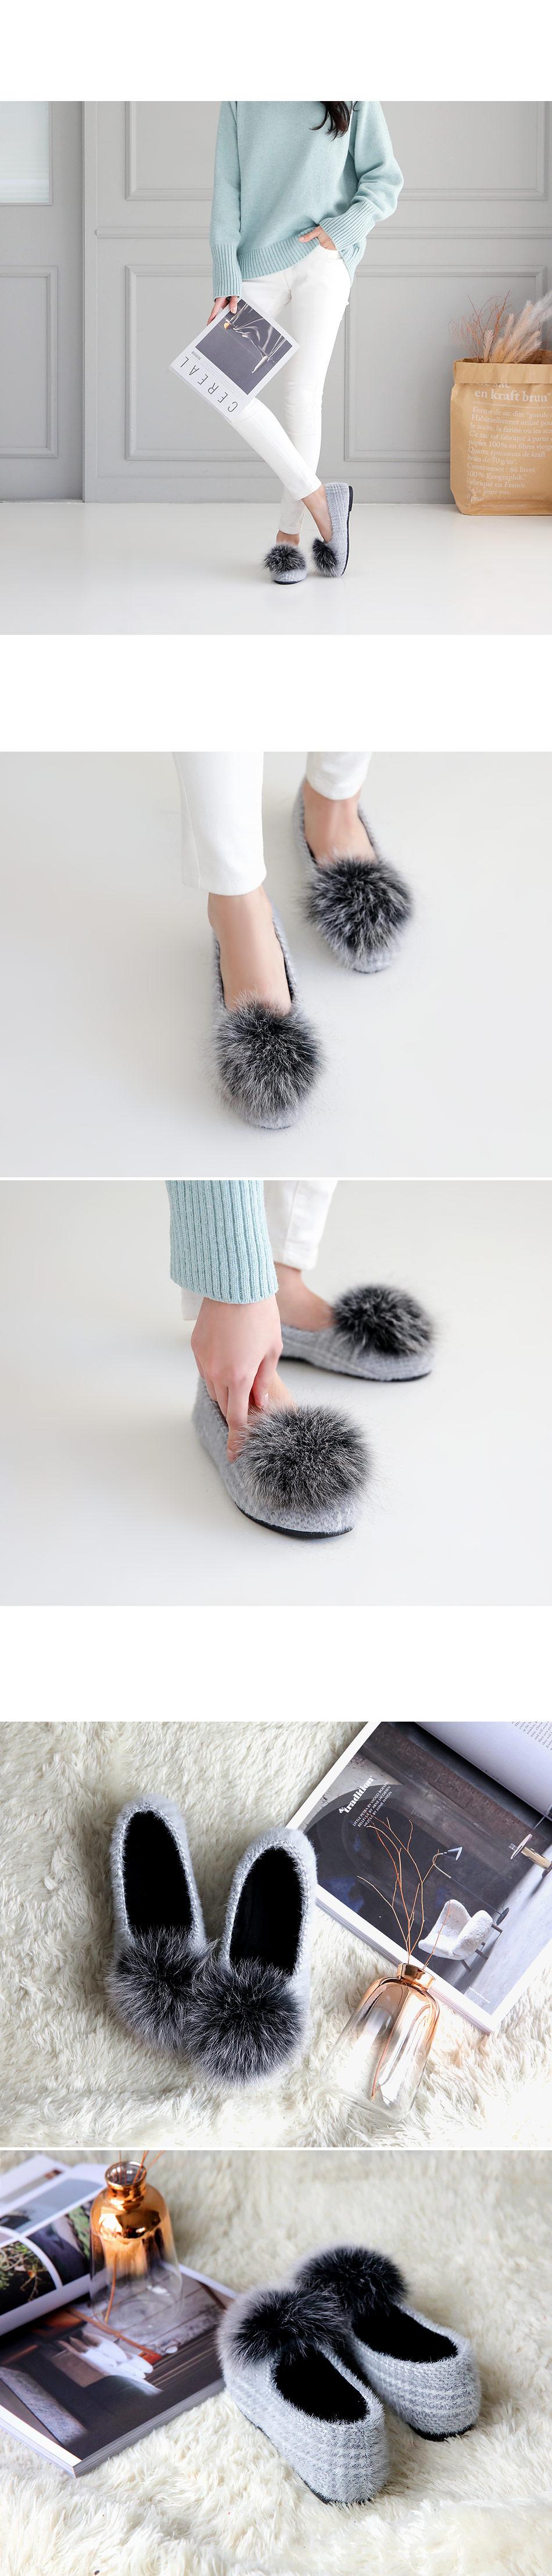 Two-elon per flat shoes 1cm